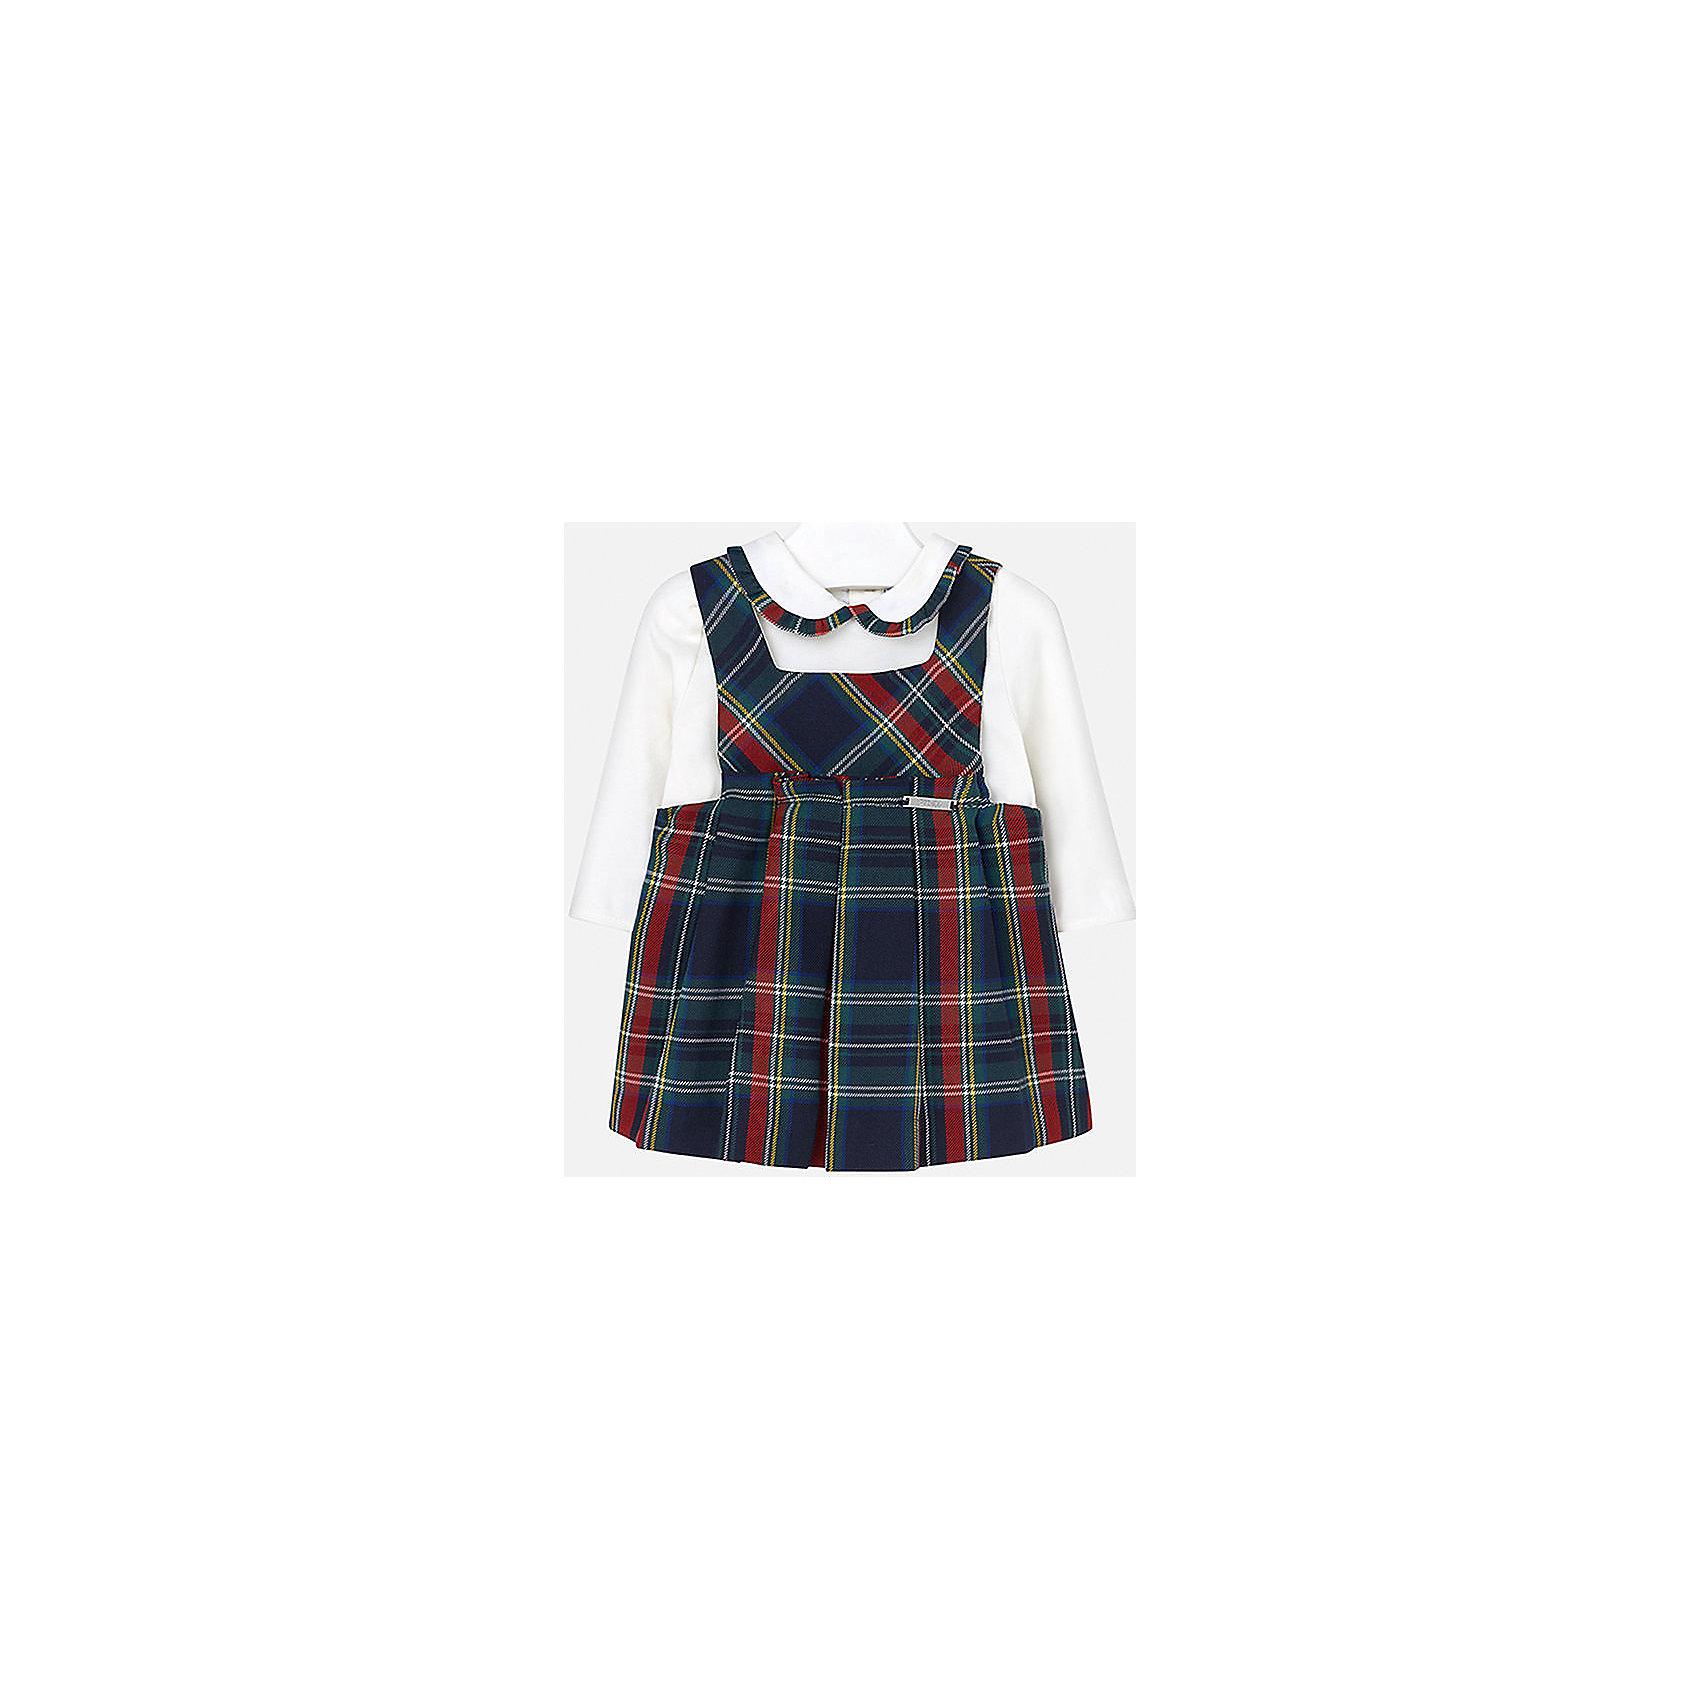 Mayoral Комплект для девочки: блузка и сарафан Mayoral